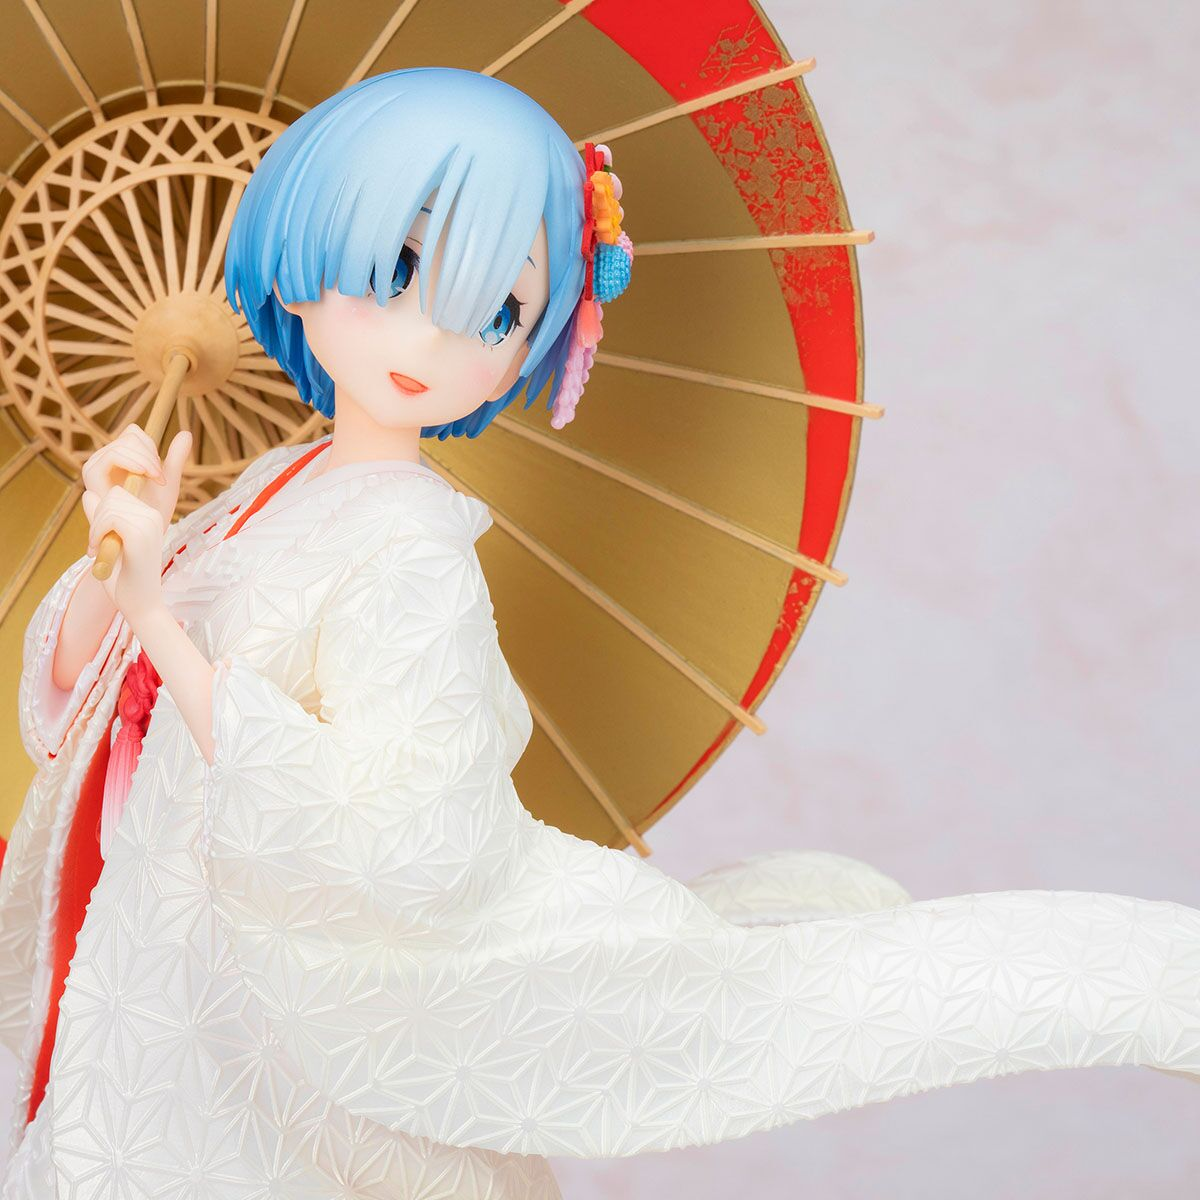 Rem Shiromuku Ver Re:ZERO Starting Life in Another World Figure